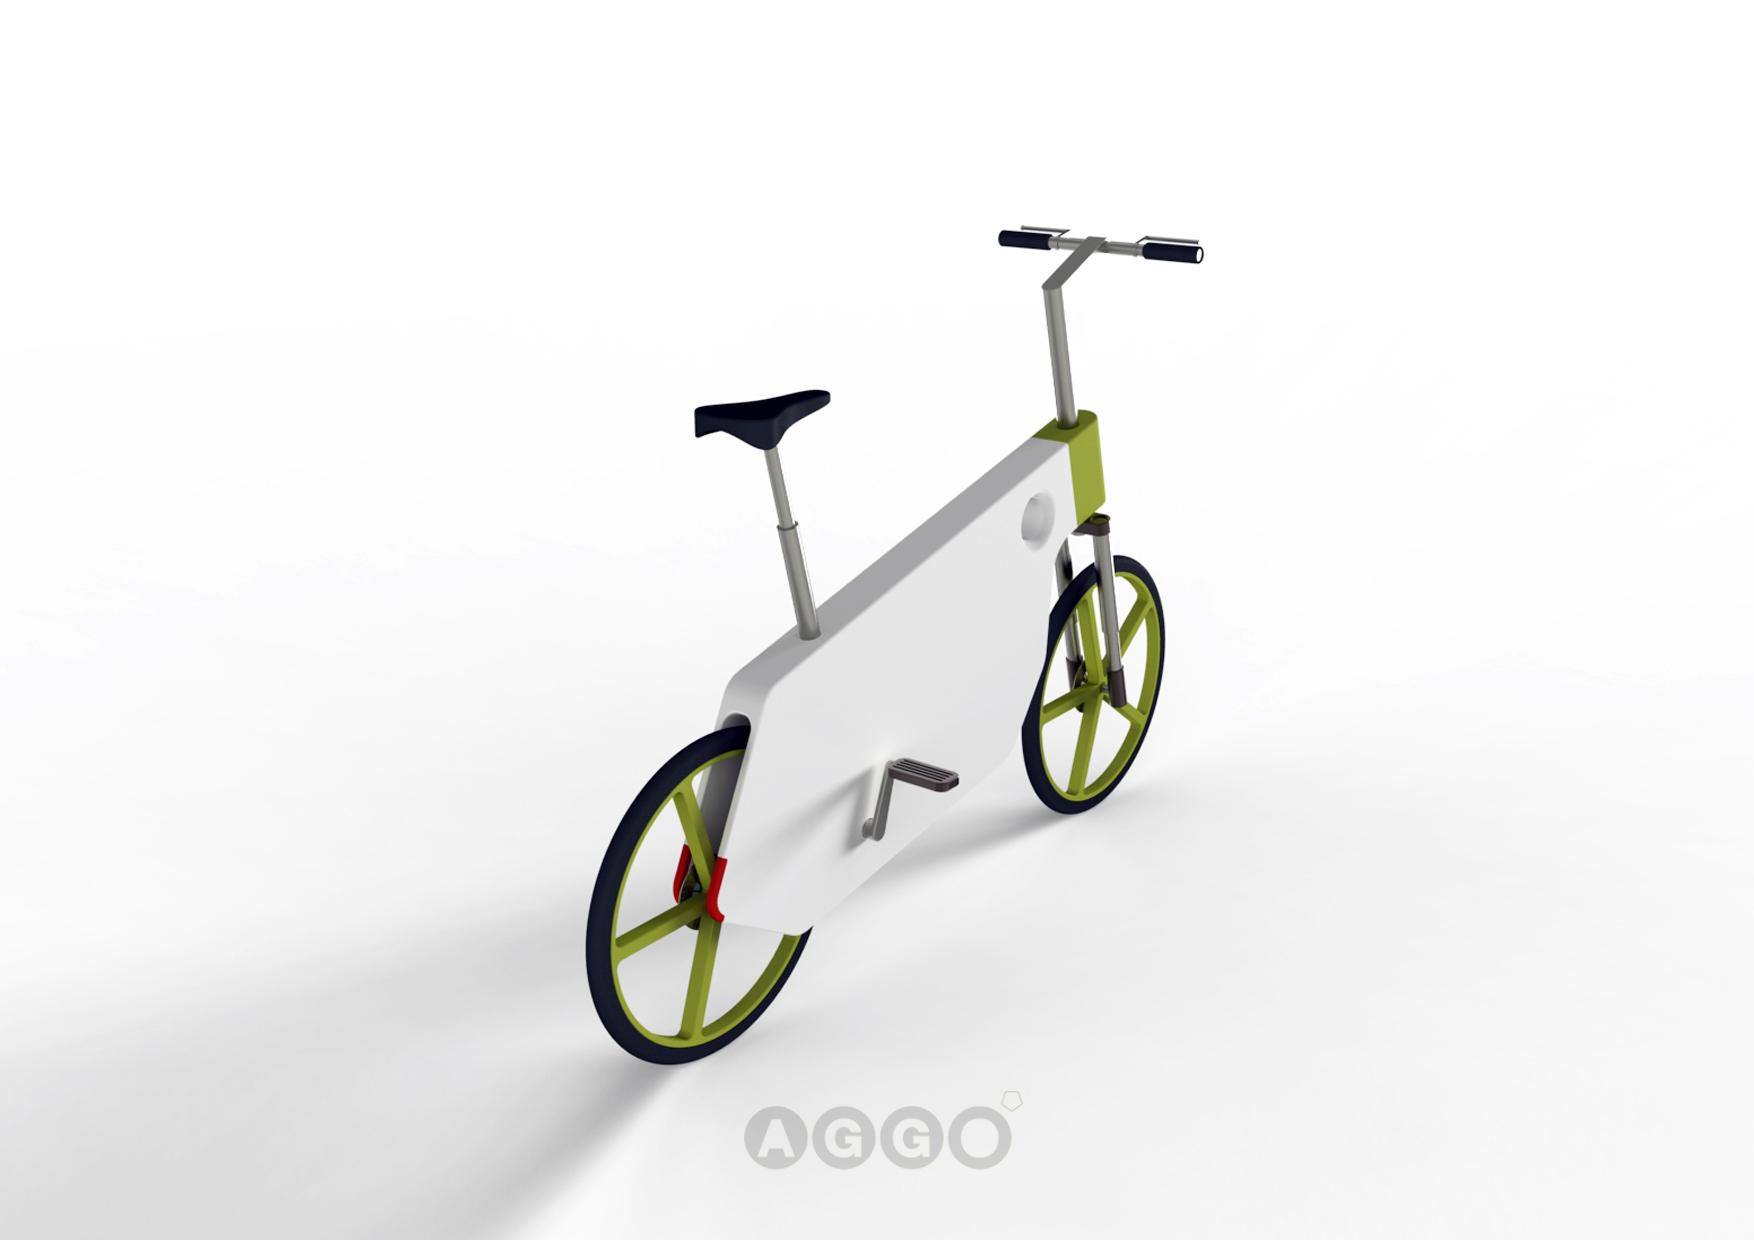 aggo_tesla_bike002.jpg